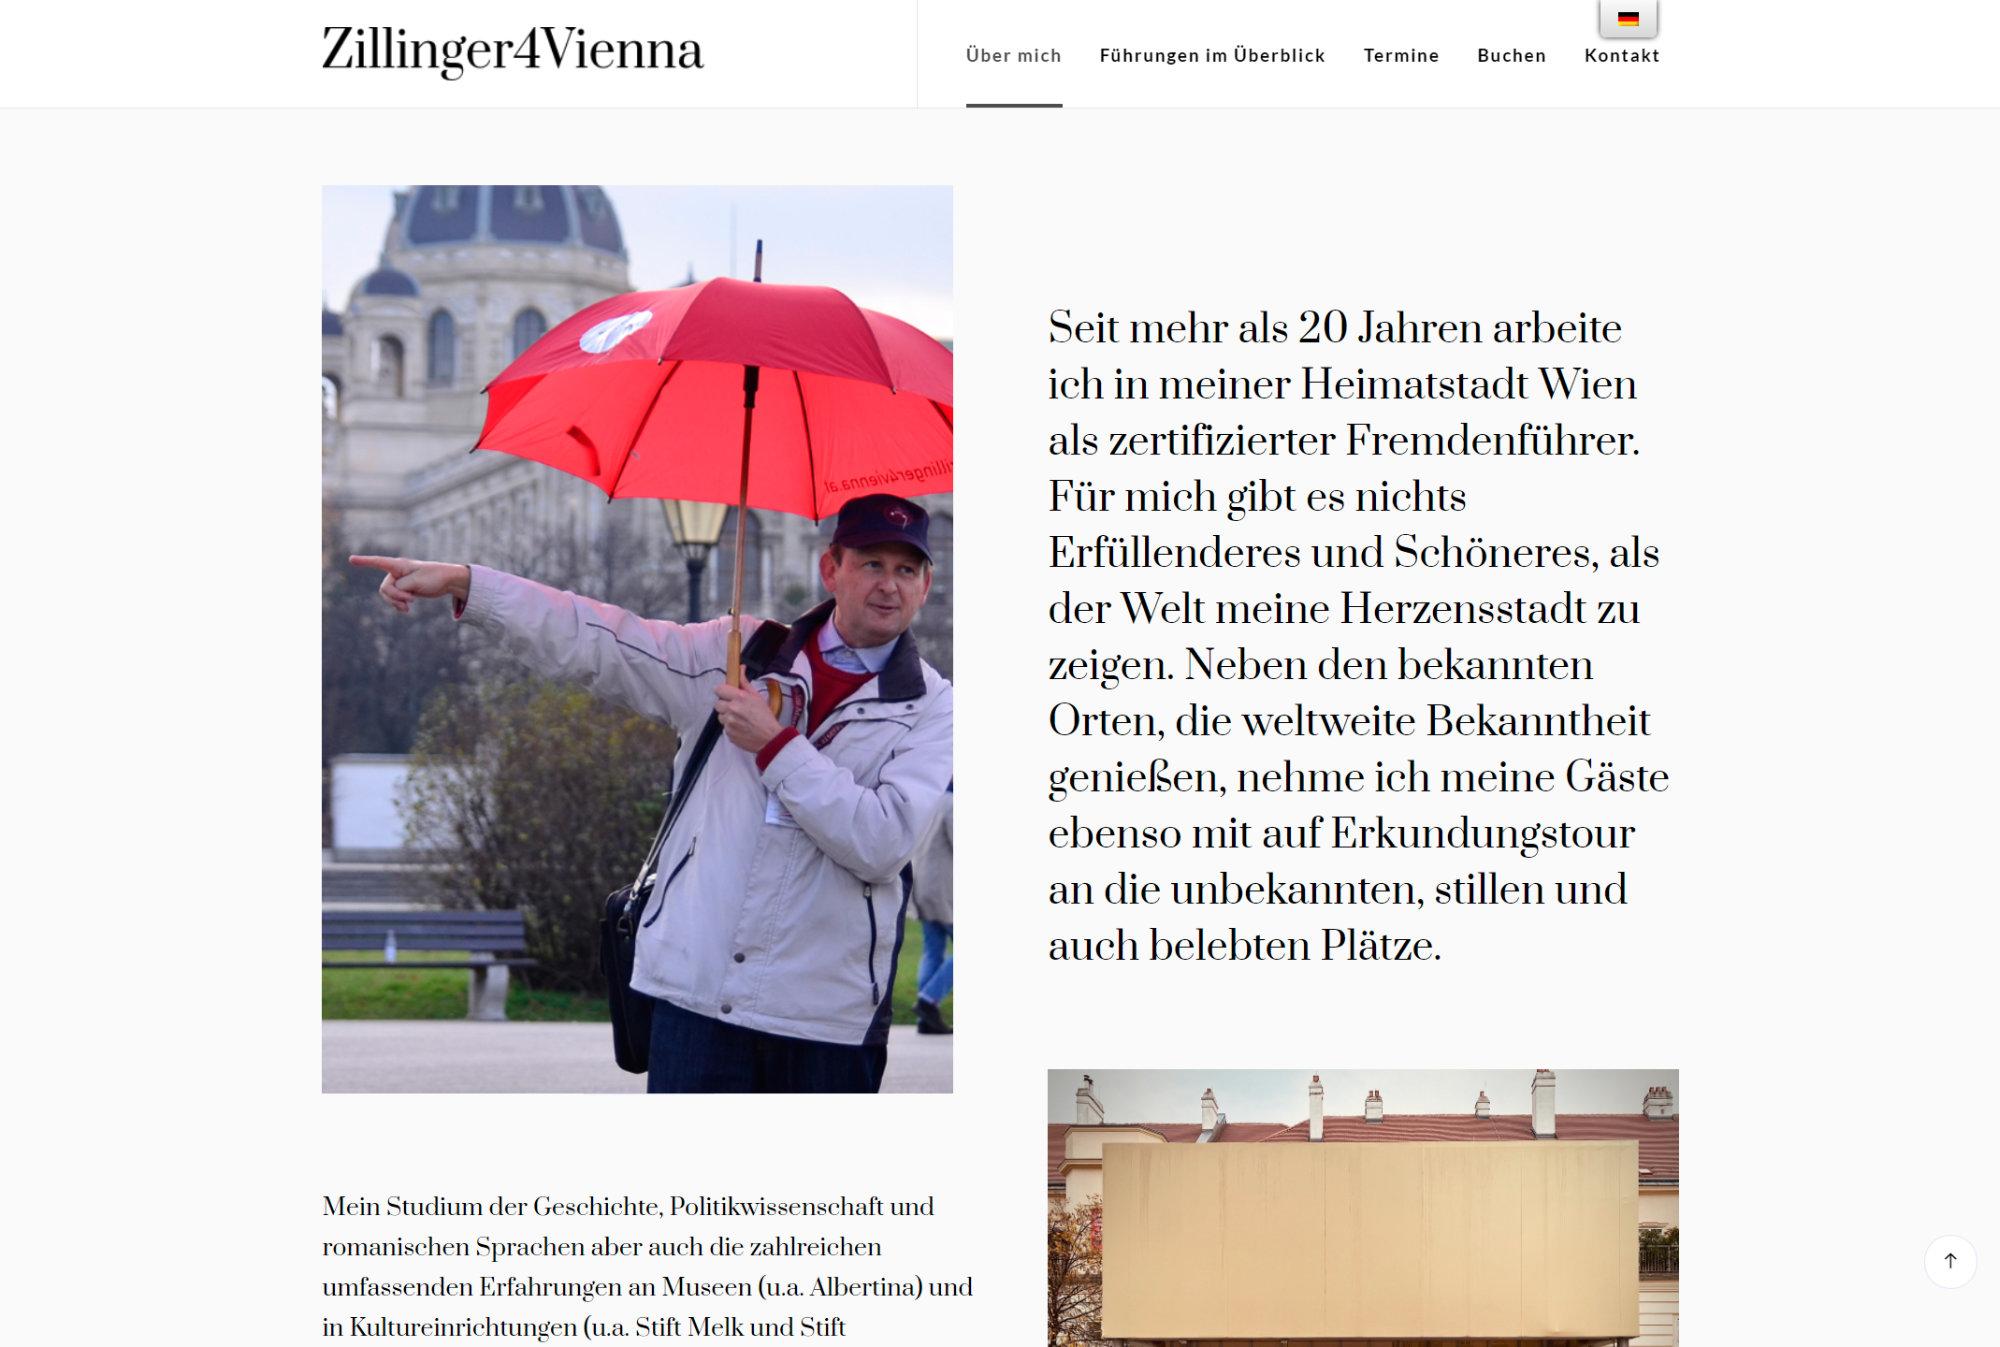 whateverworks-Zillinger4Vienna-B